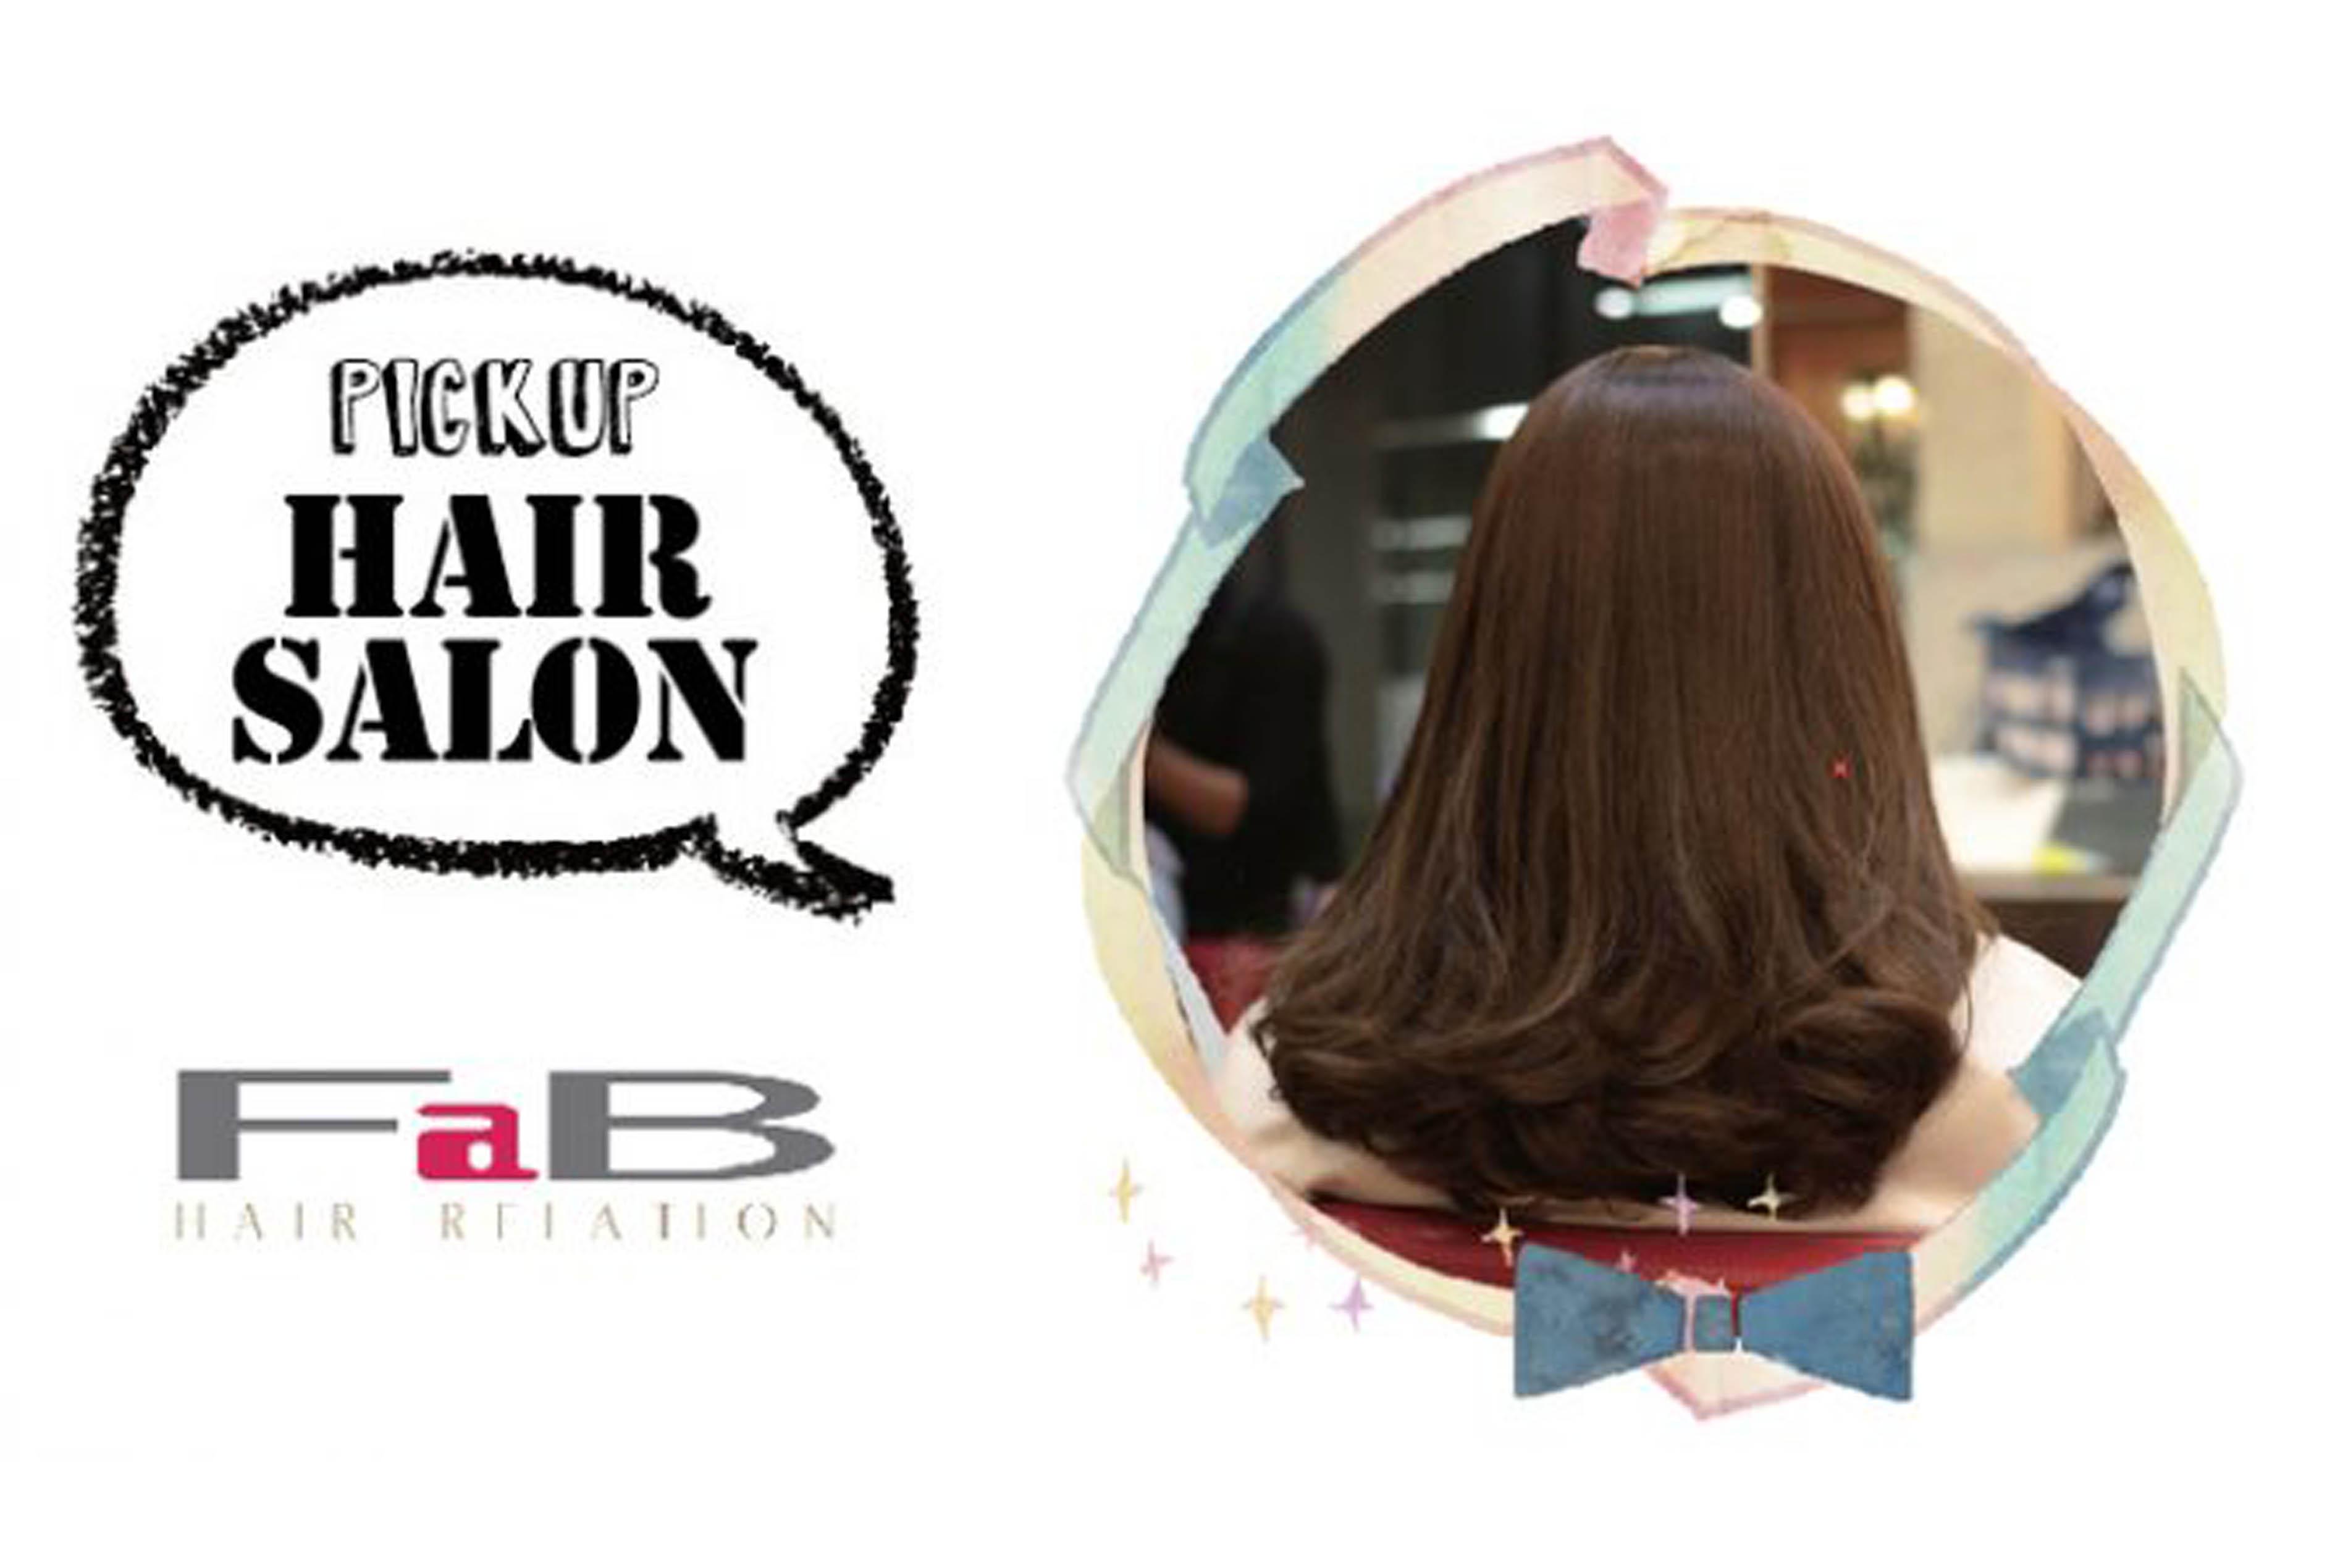 【PICK UP HAIR SALON】 FaB RELATION Bangkok